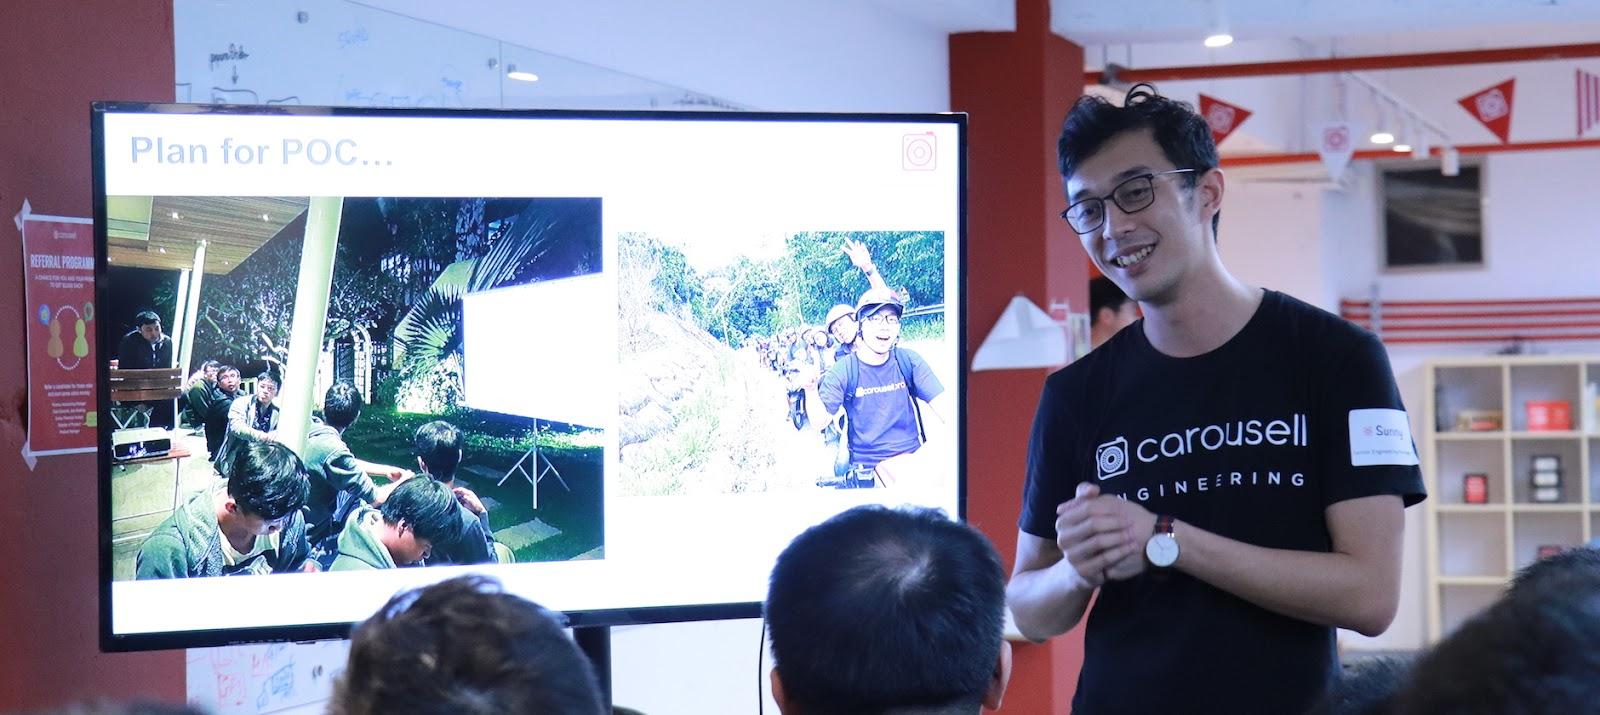 Carousell 旋轉拍賣的 Senior Engineering Manager Sunny 特別從新加坡飛來和大家分享在開發及設計 Smart Listing 遇到的挑戰